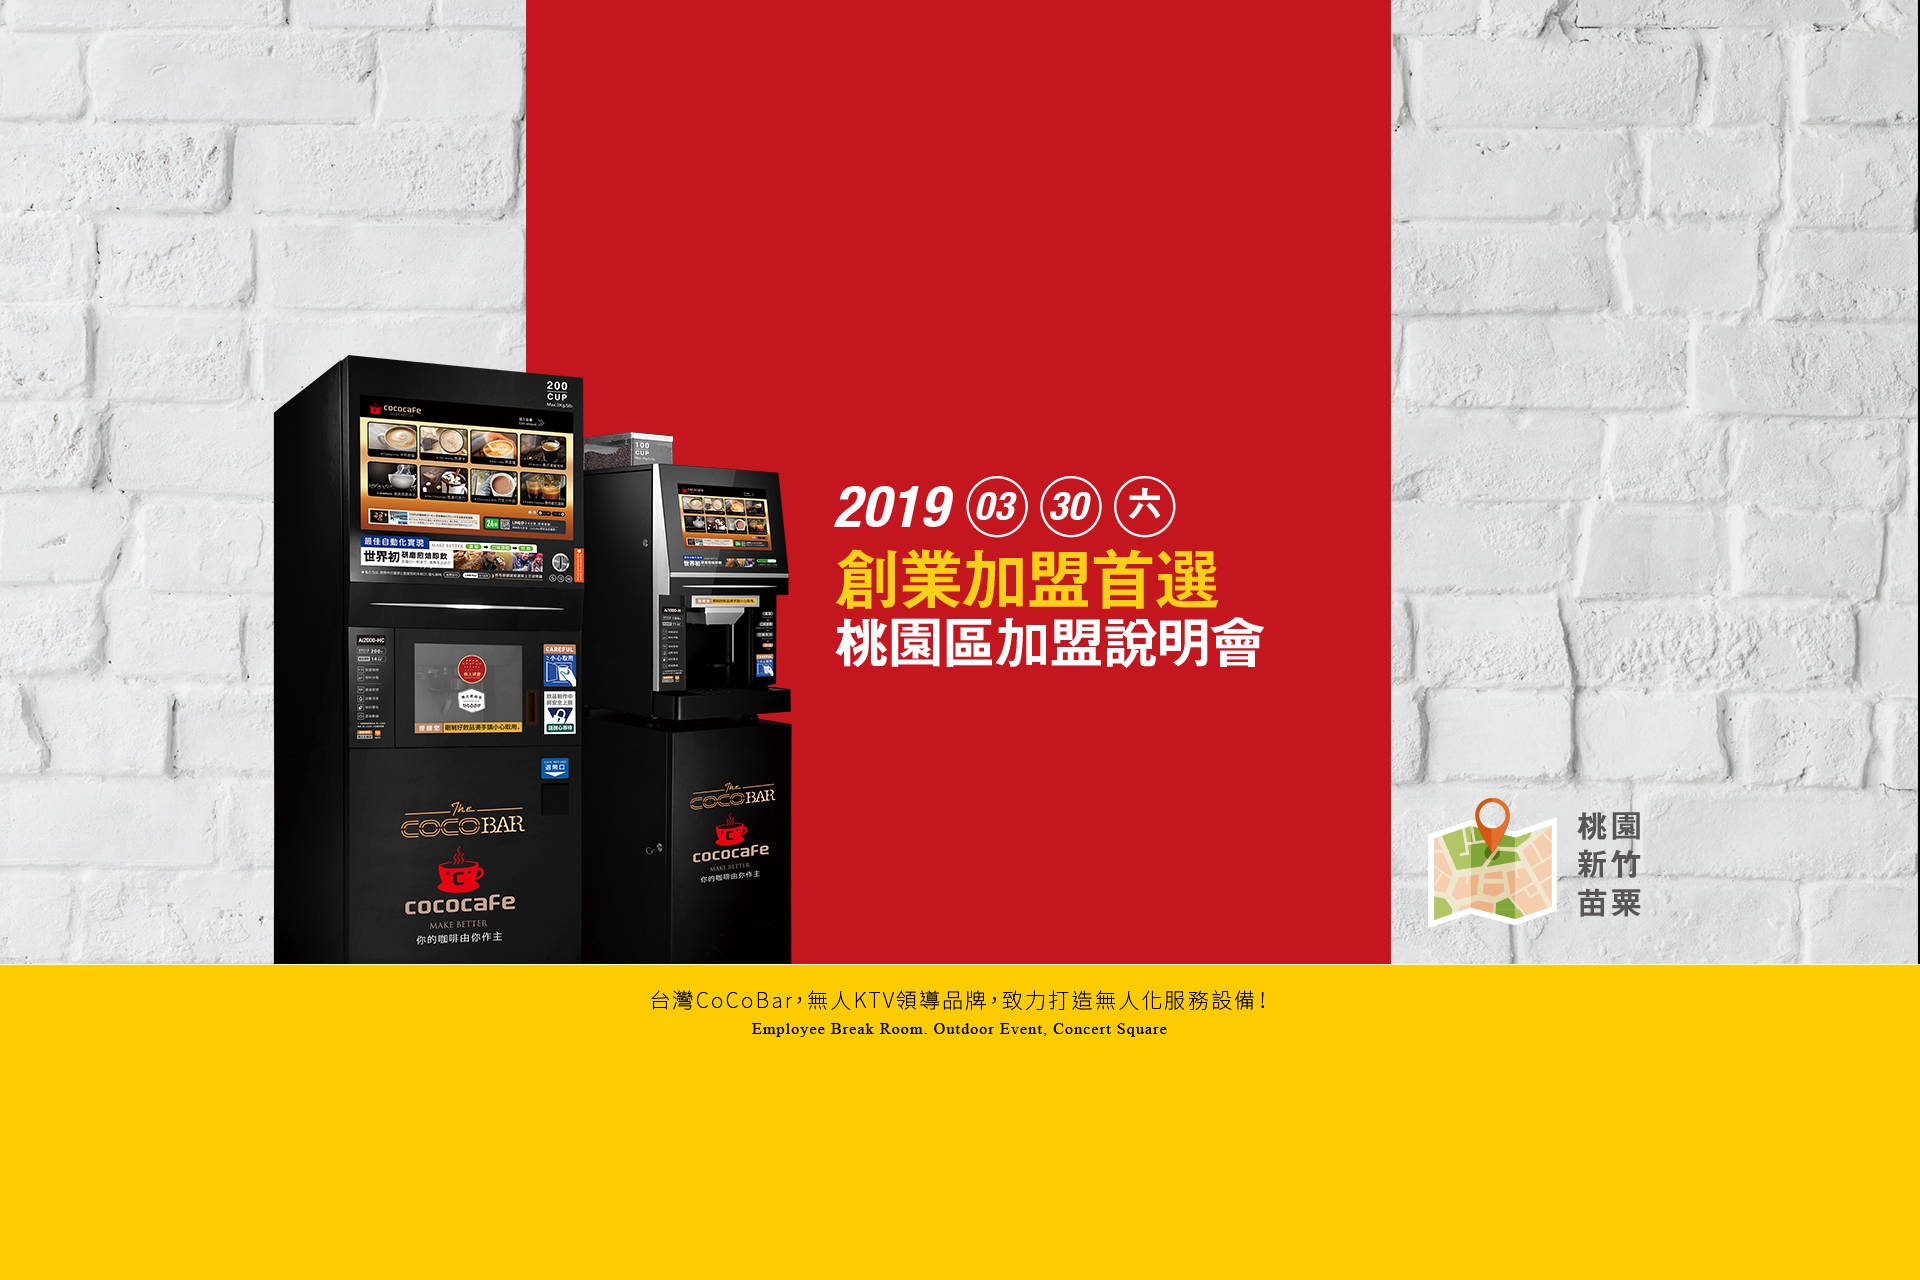 CoCoBar迷你電話亭KTV專家-臺灣官方網站